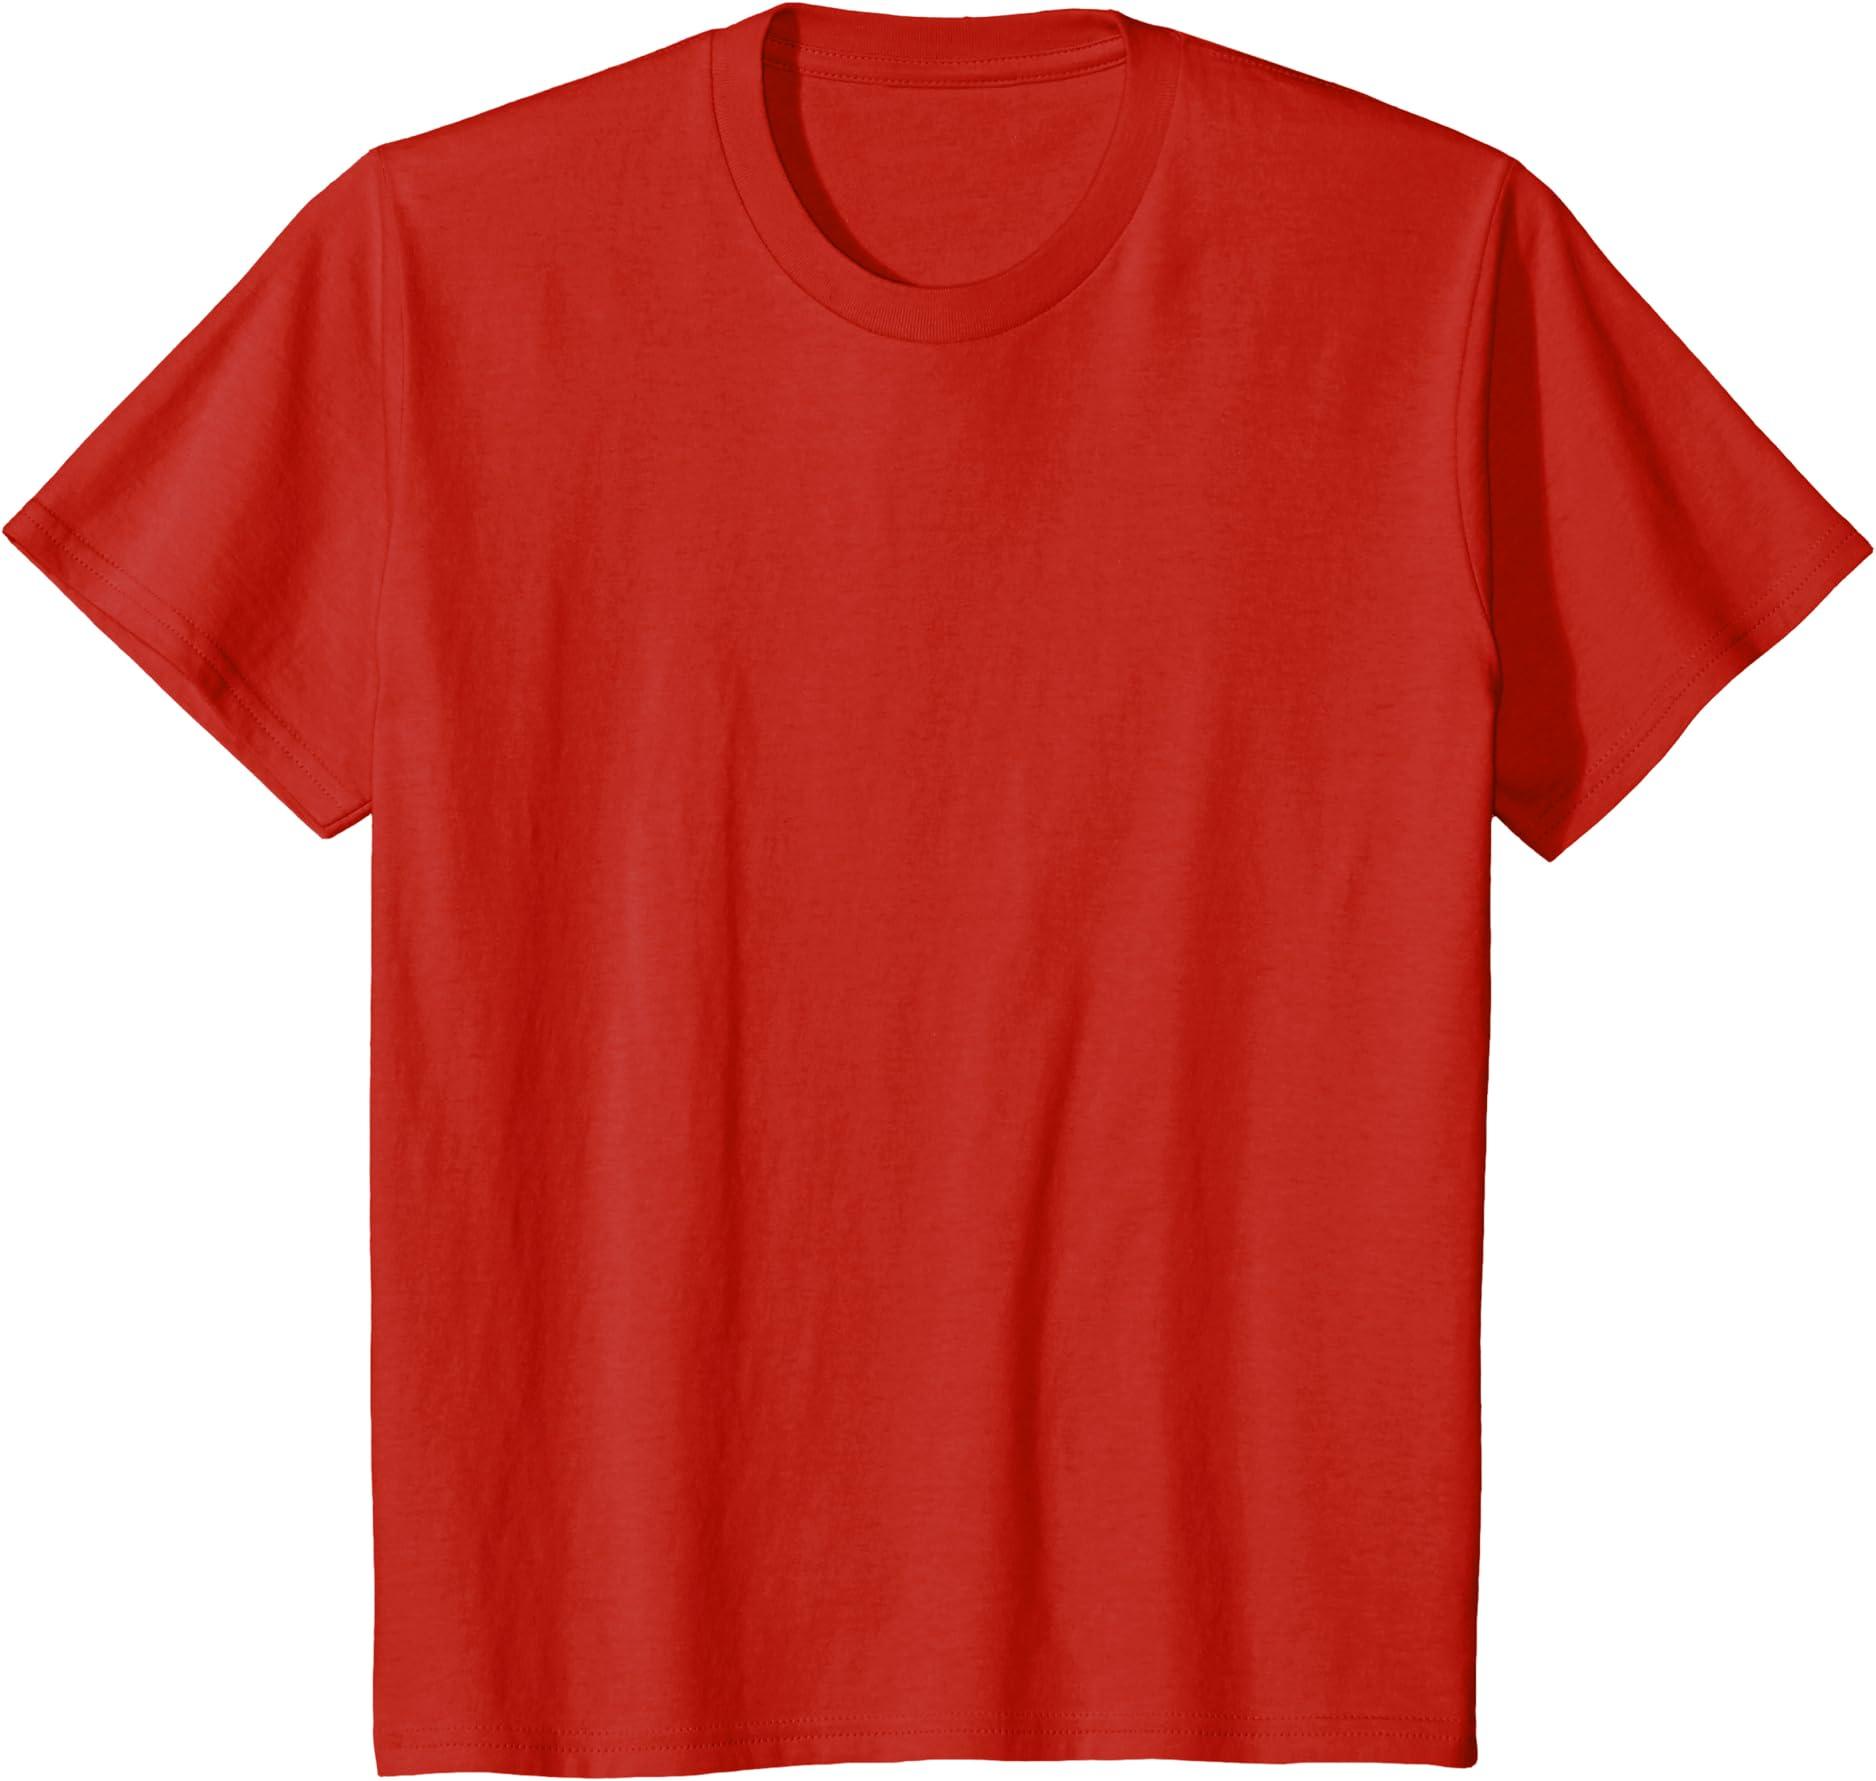 Merry Christmarx Boy/'s Youth T-Shirt Communist Christmas